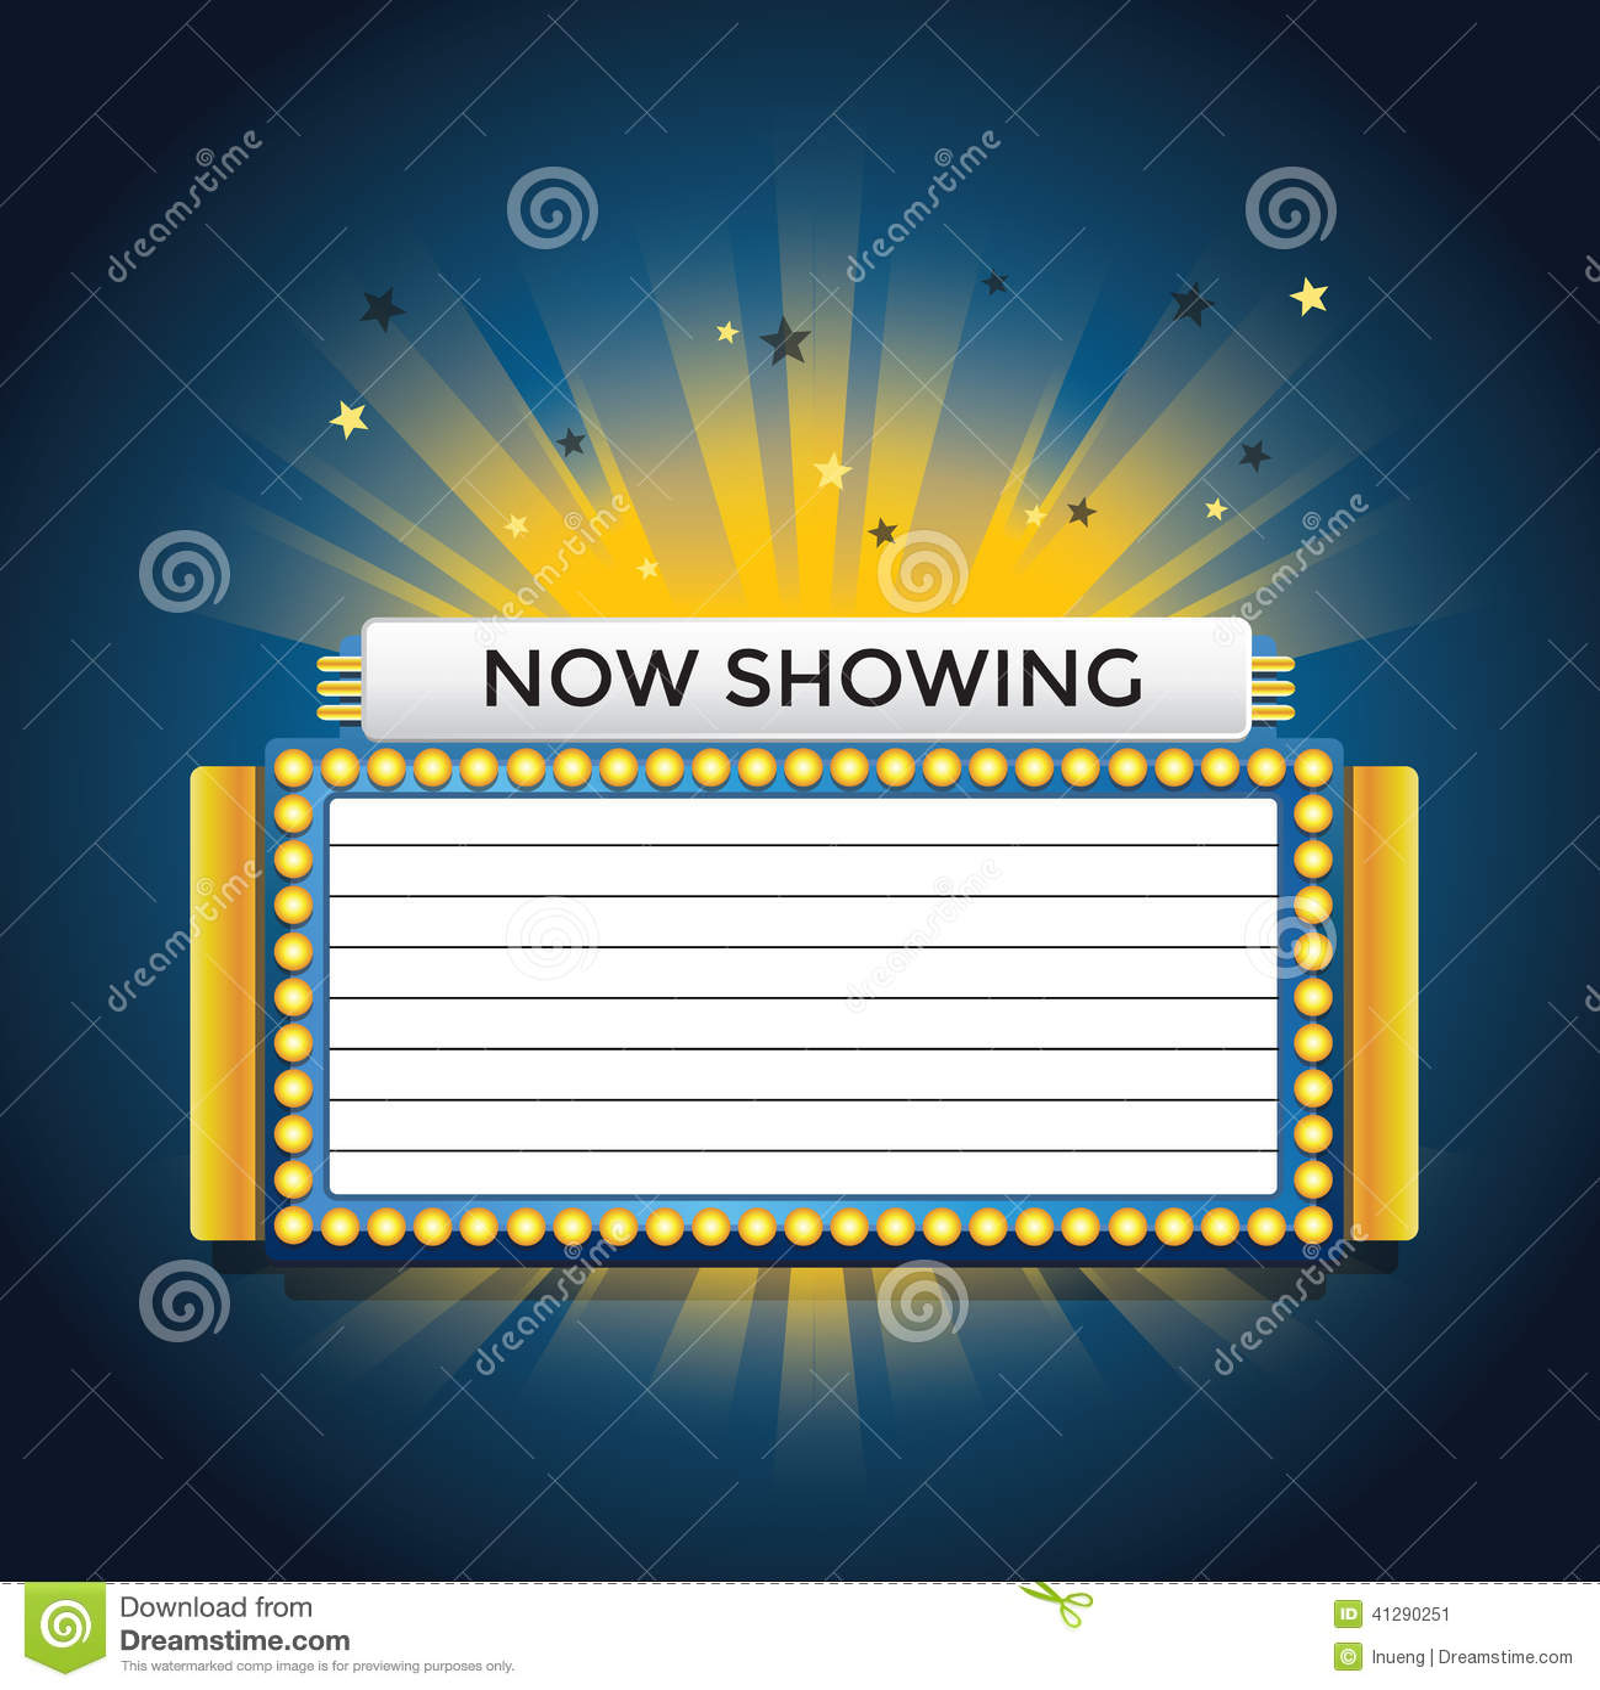 Now Showing Retro Cinema Neon Sign Stock Illustration